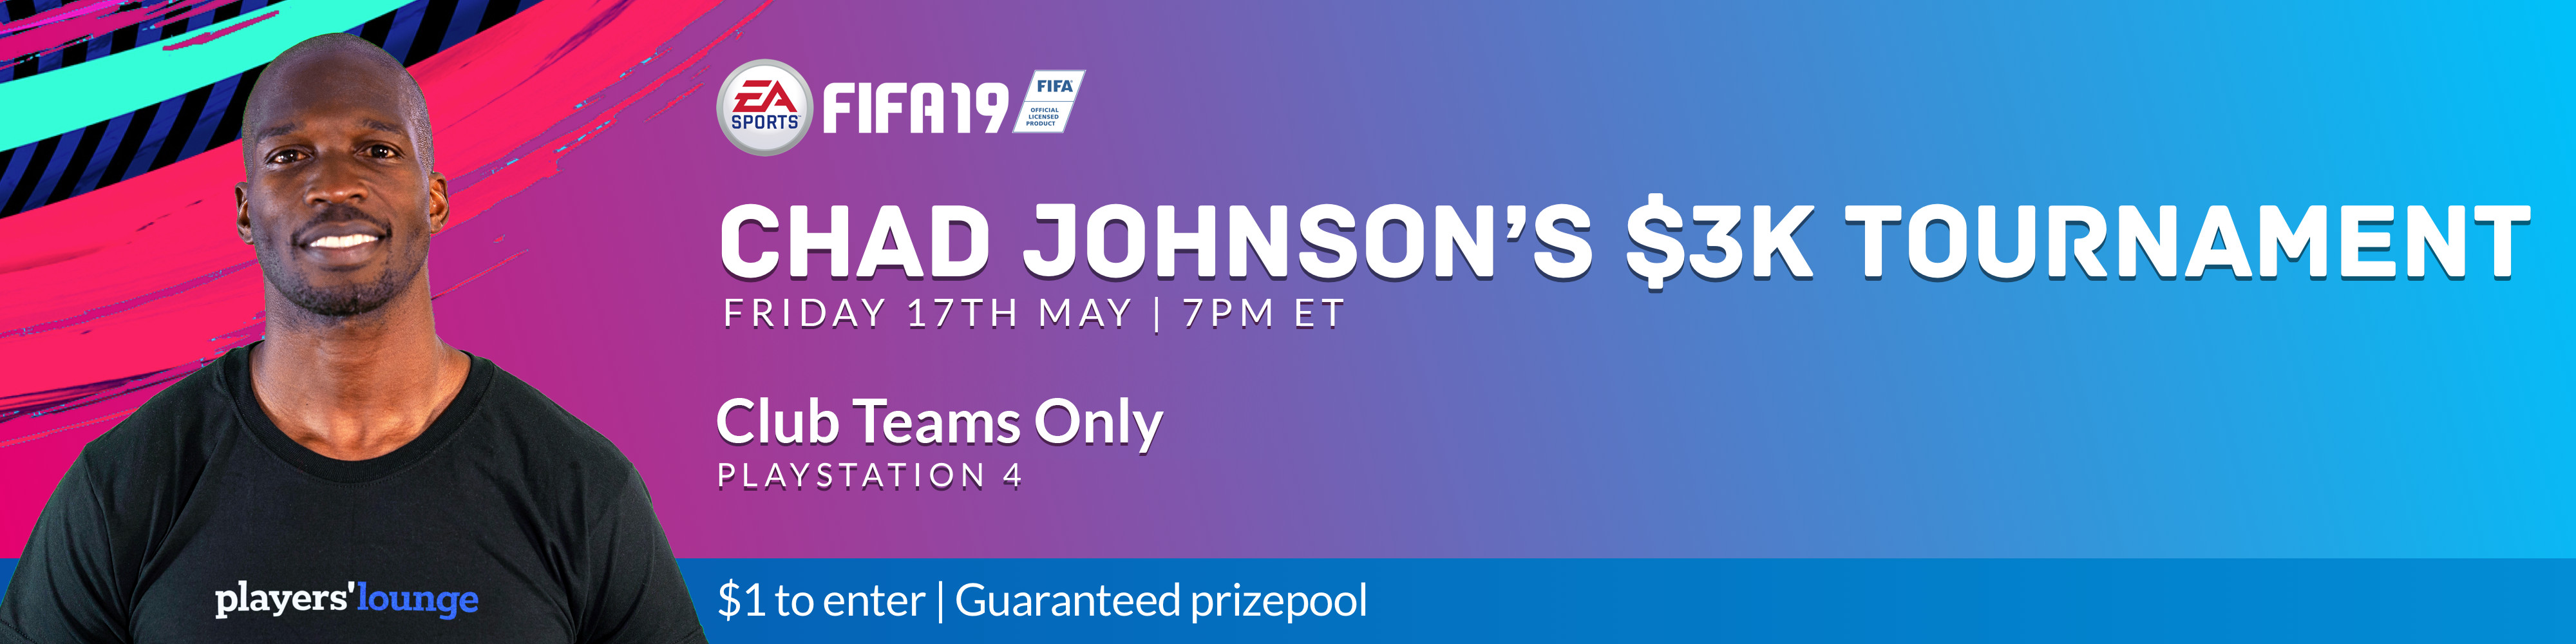 Players' Lounge - Chad Johnson's $3K FIFA Tournament